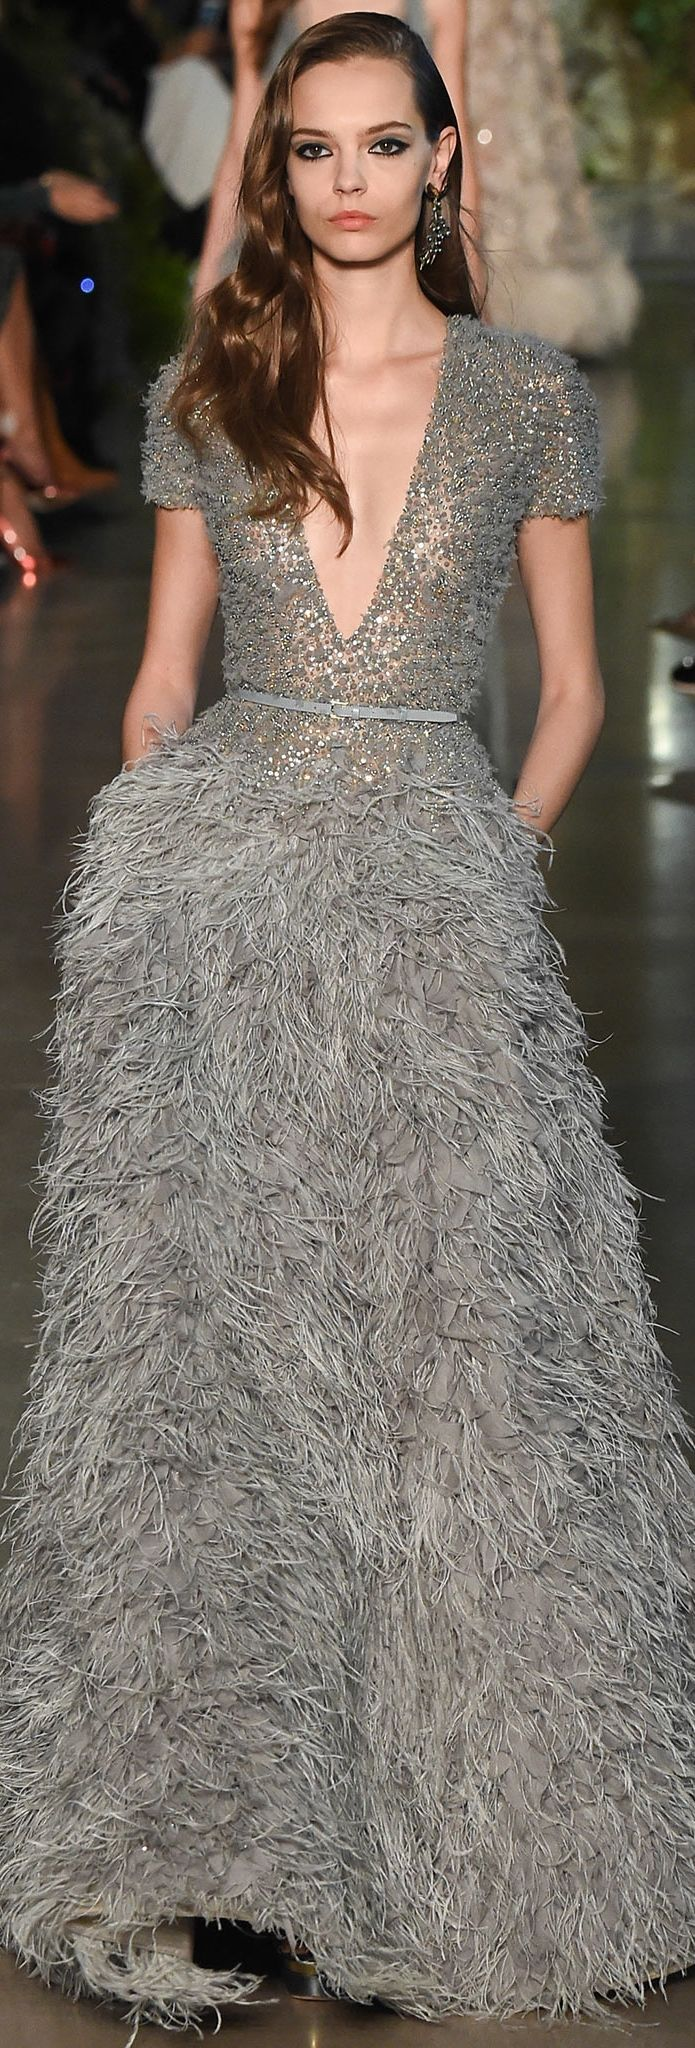 Mina Cvetkovic at Elie Saab Couture Spring 2015